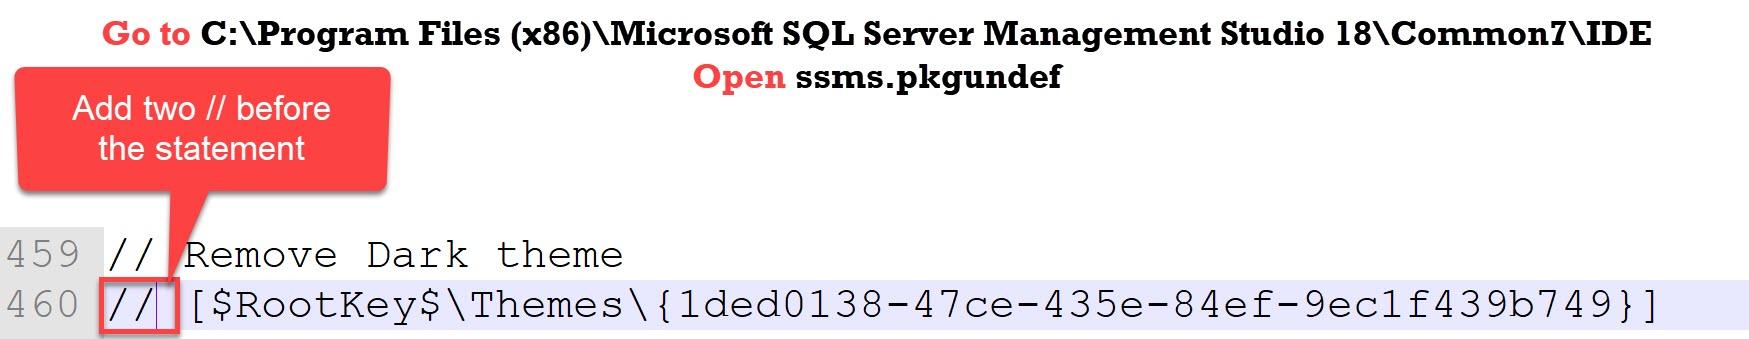 SQL SERVER Management Studio 18 - Enable Dark Theme darktheme3